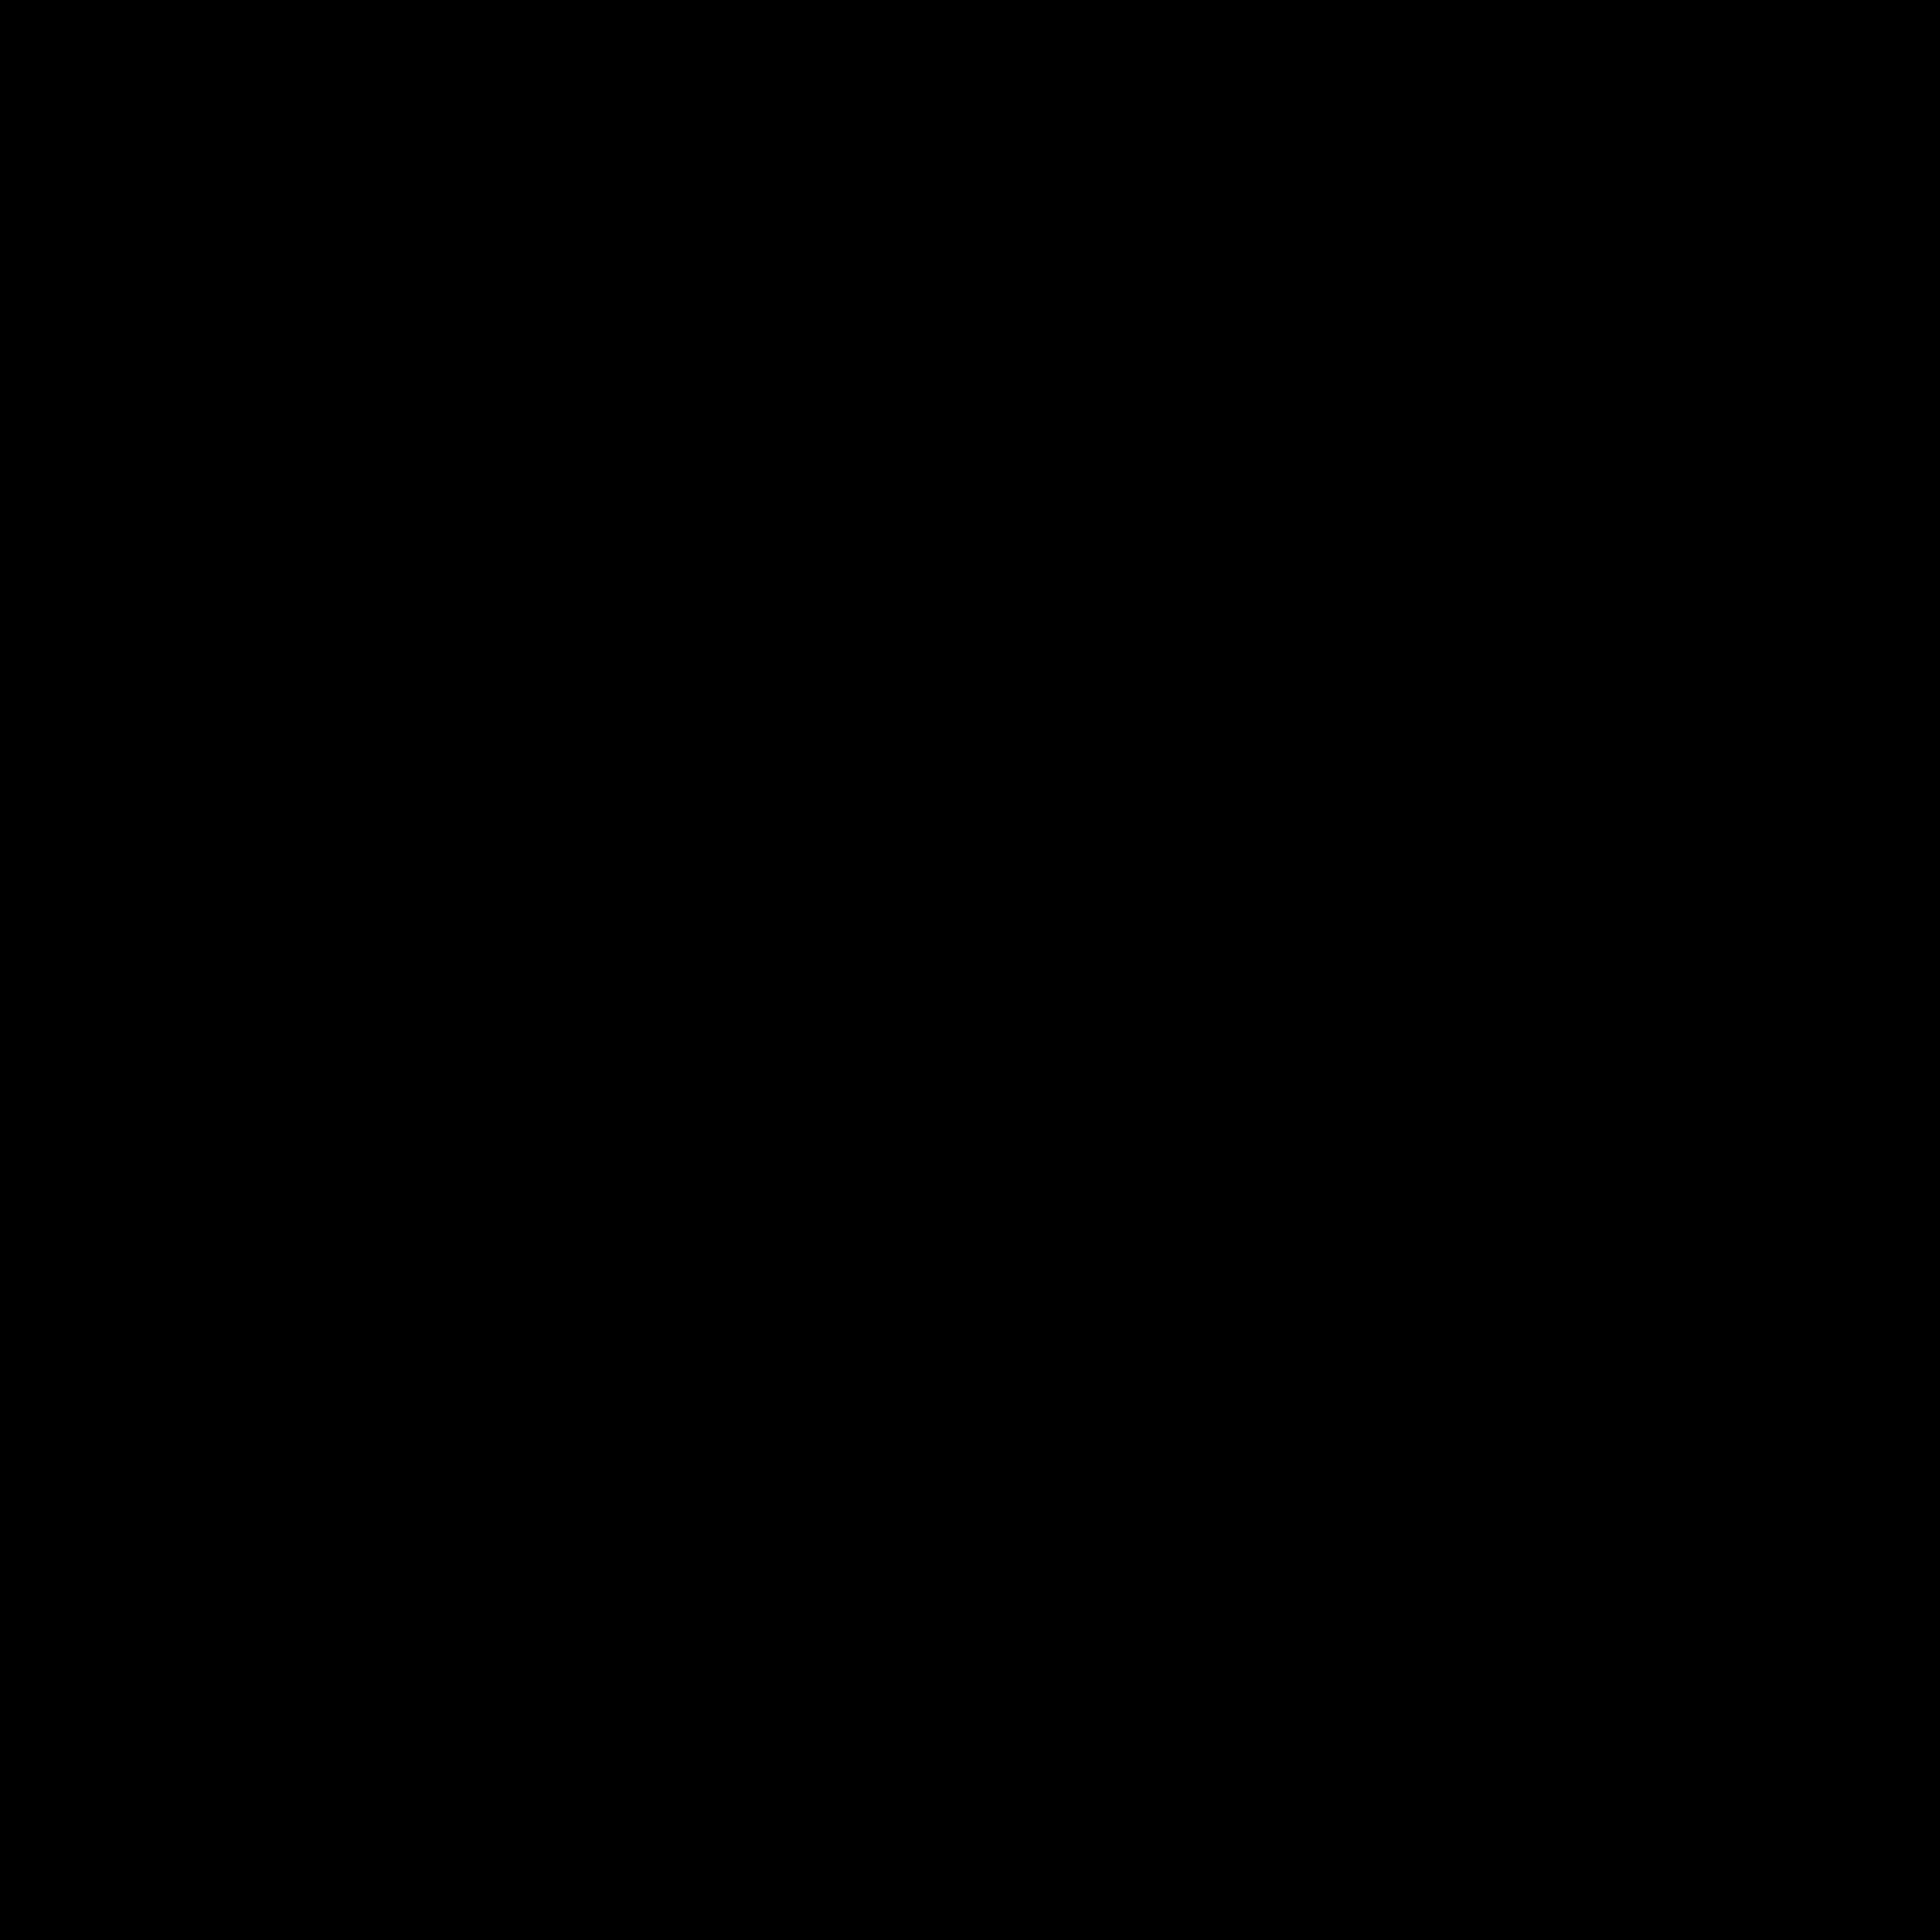 The Line Art : Sans lineart by ladyevel on deviantart